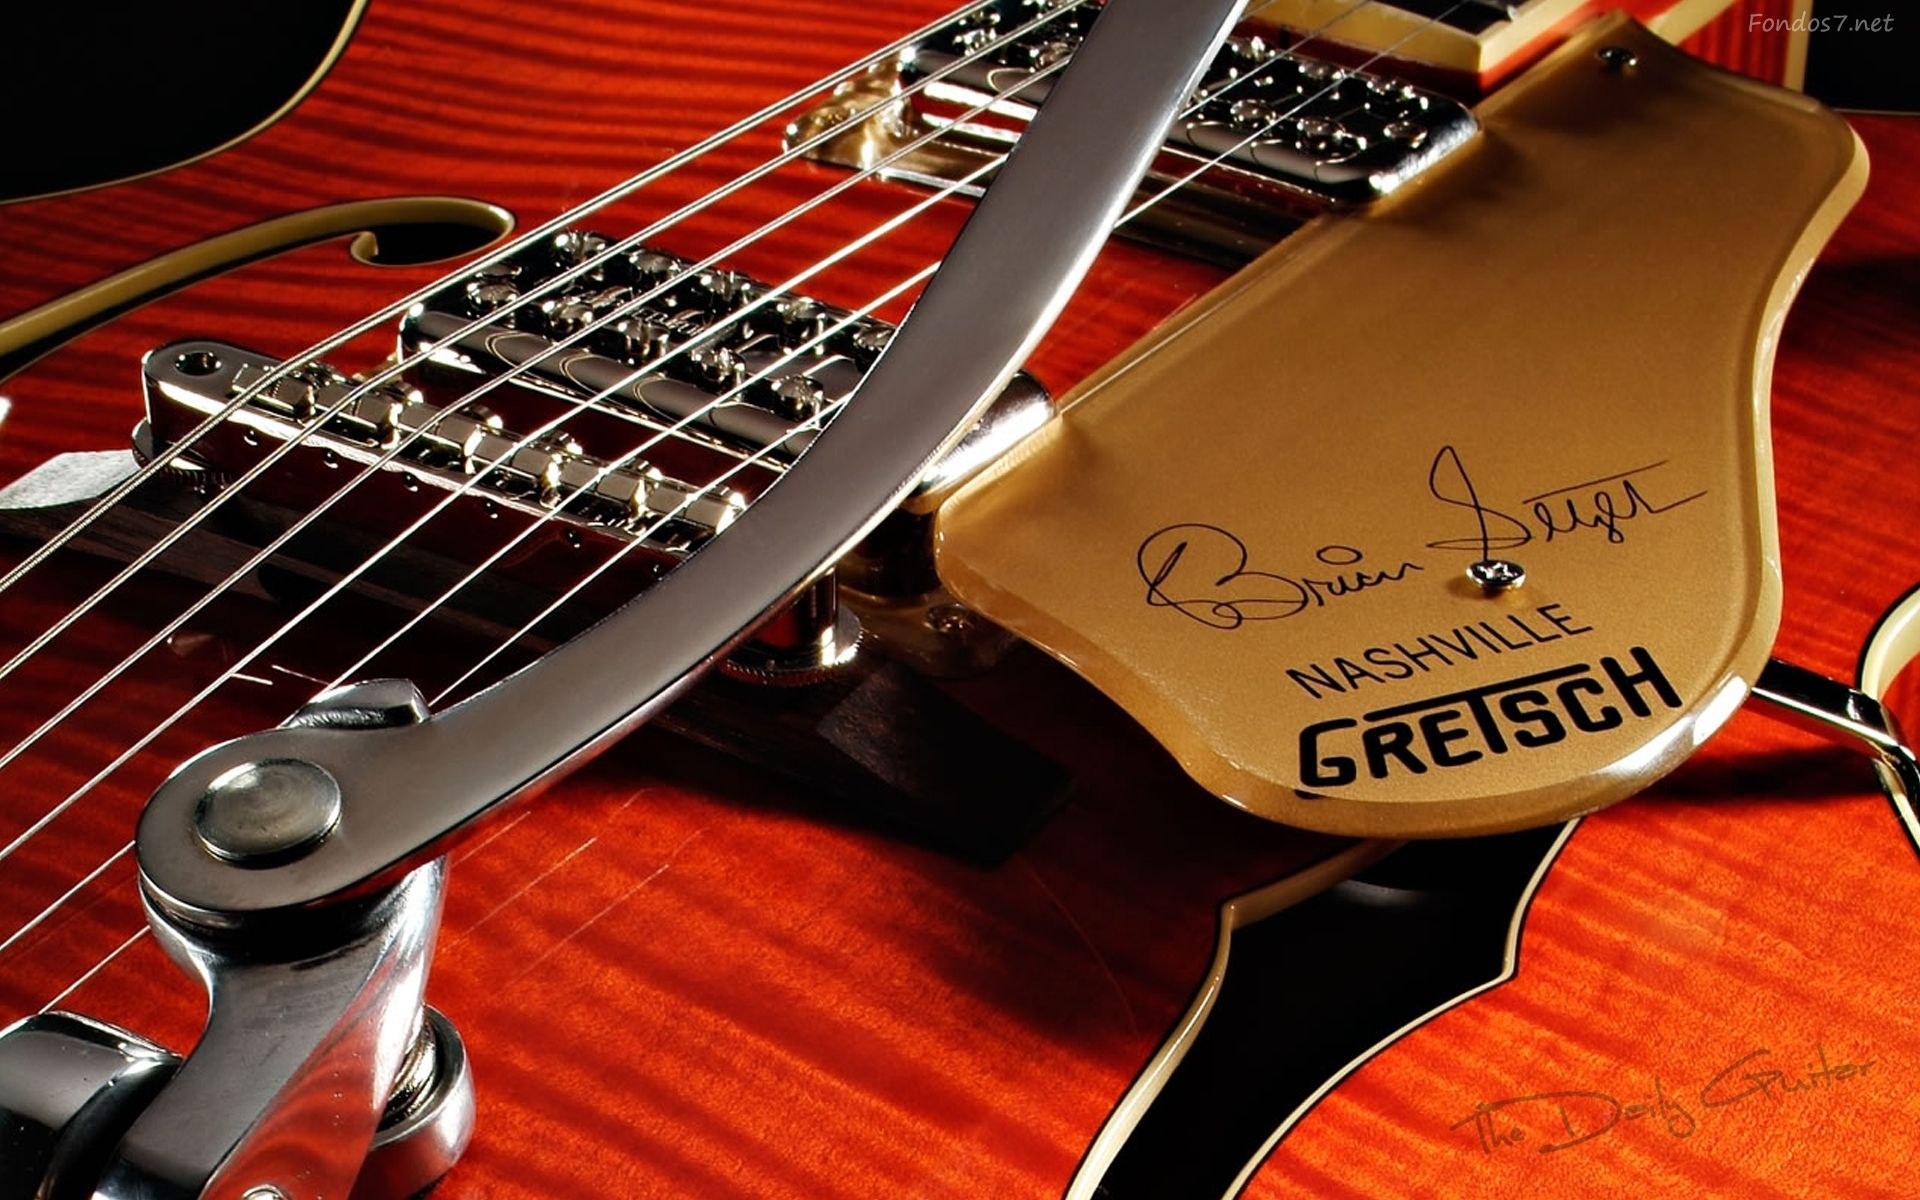 Fender Guitar, Full HD Wallpaper